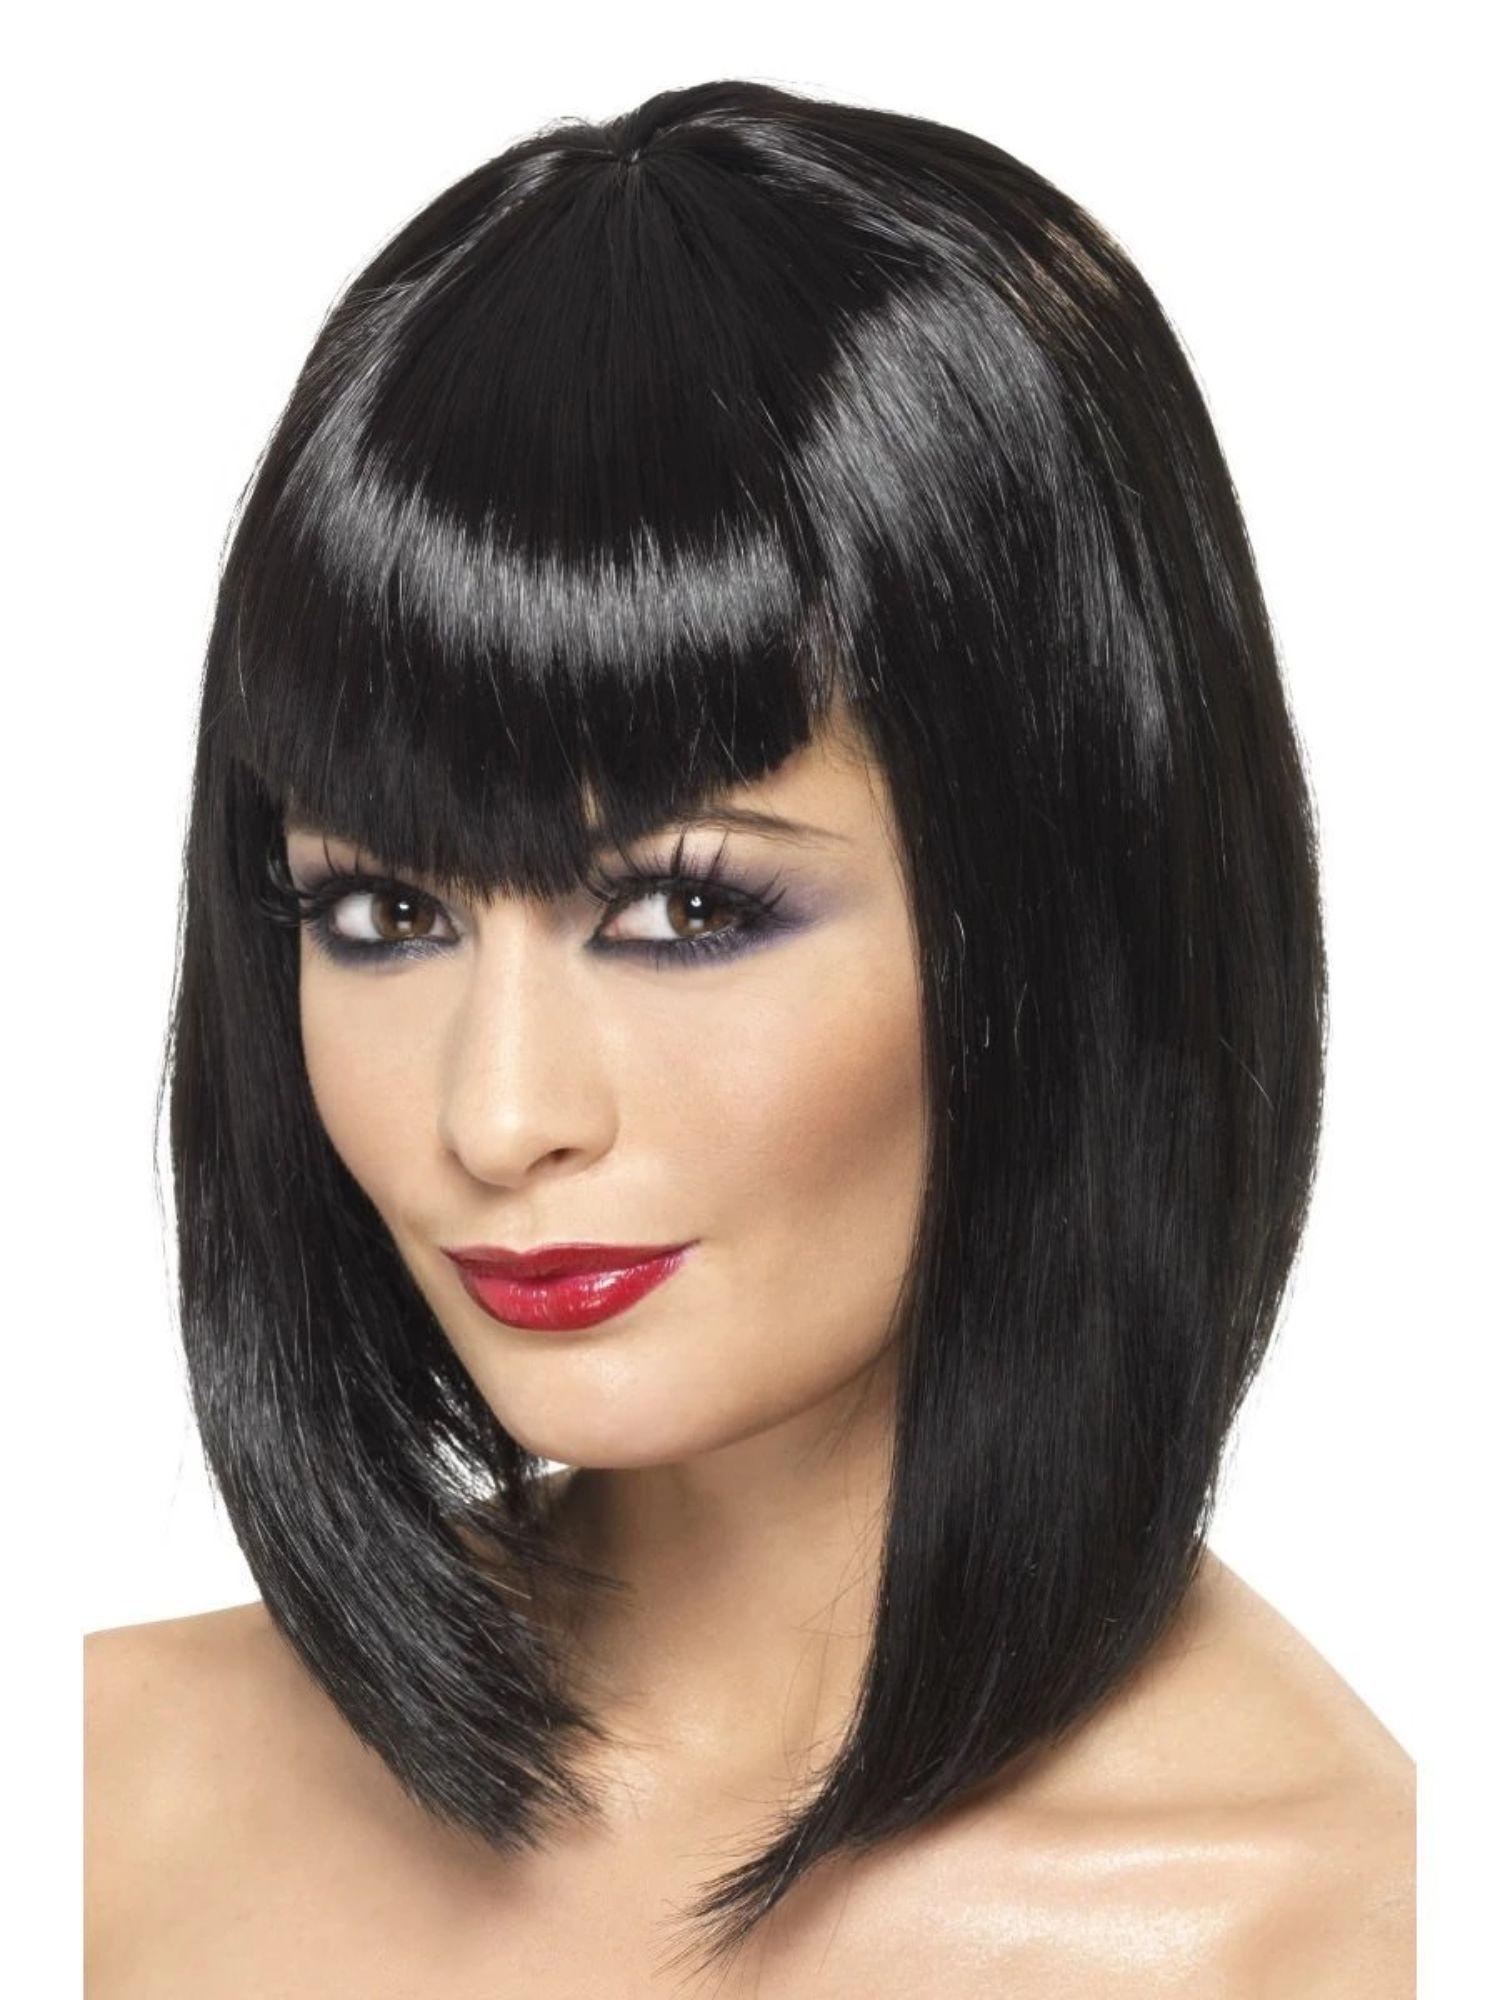 Short Black Vampiress Adult Costume Wig